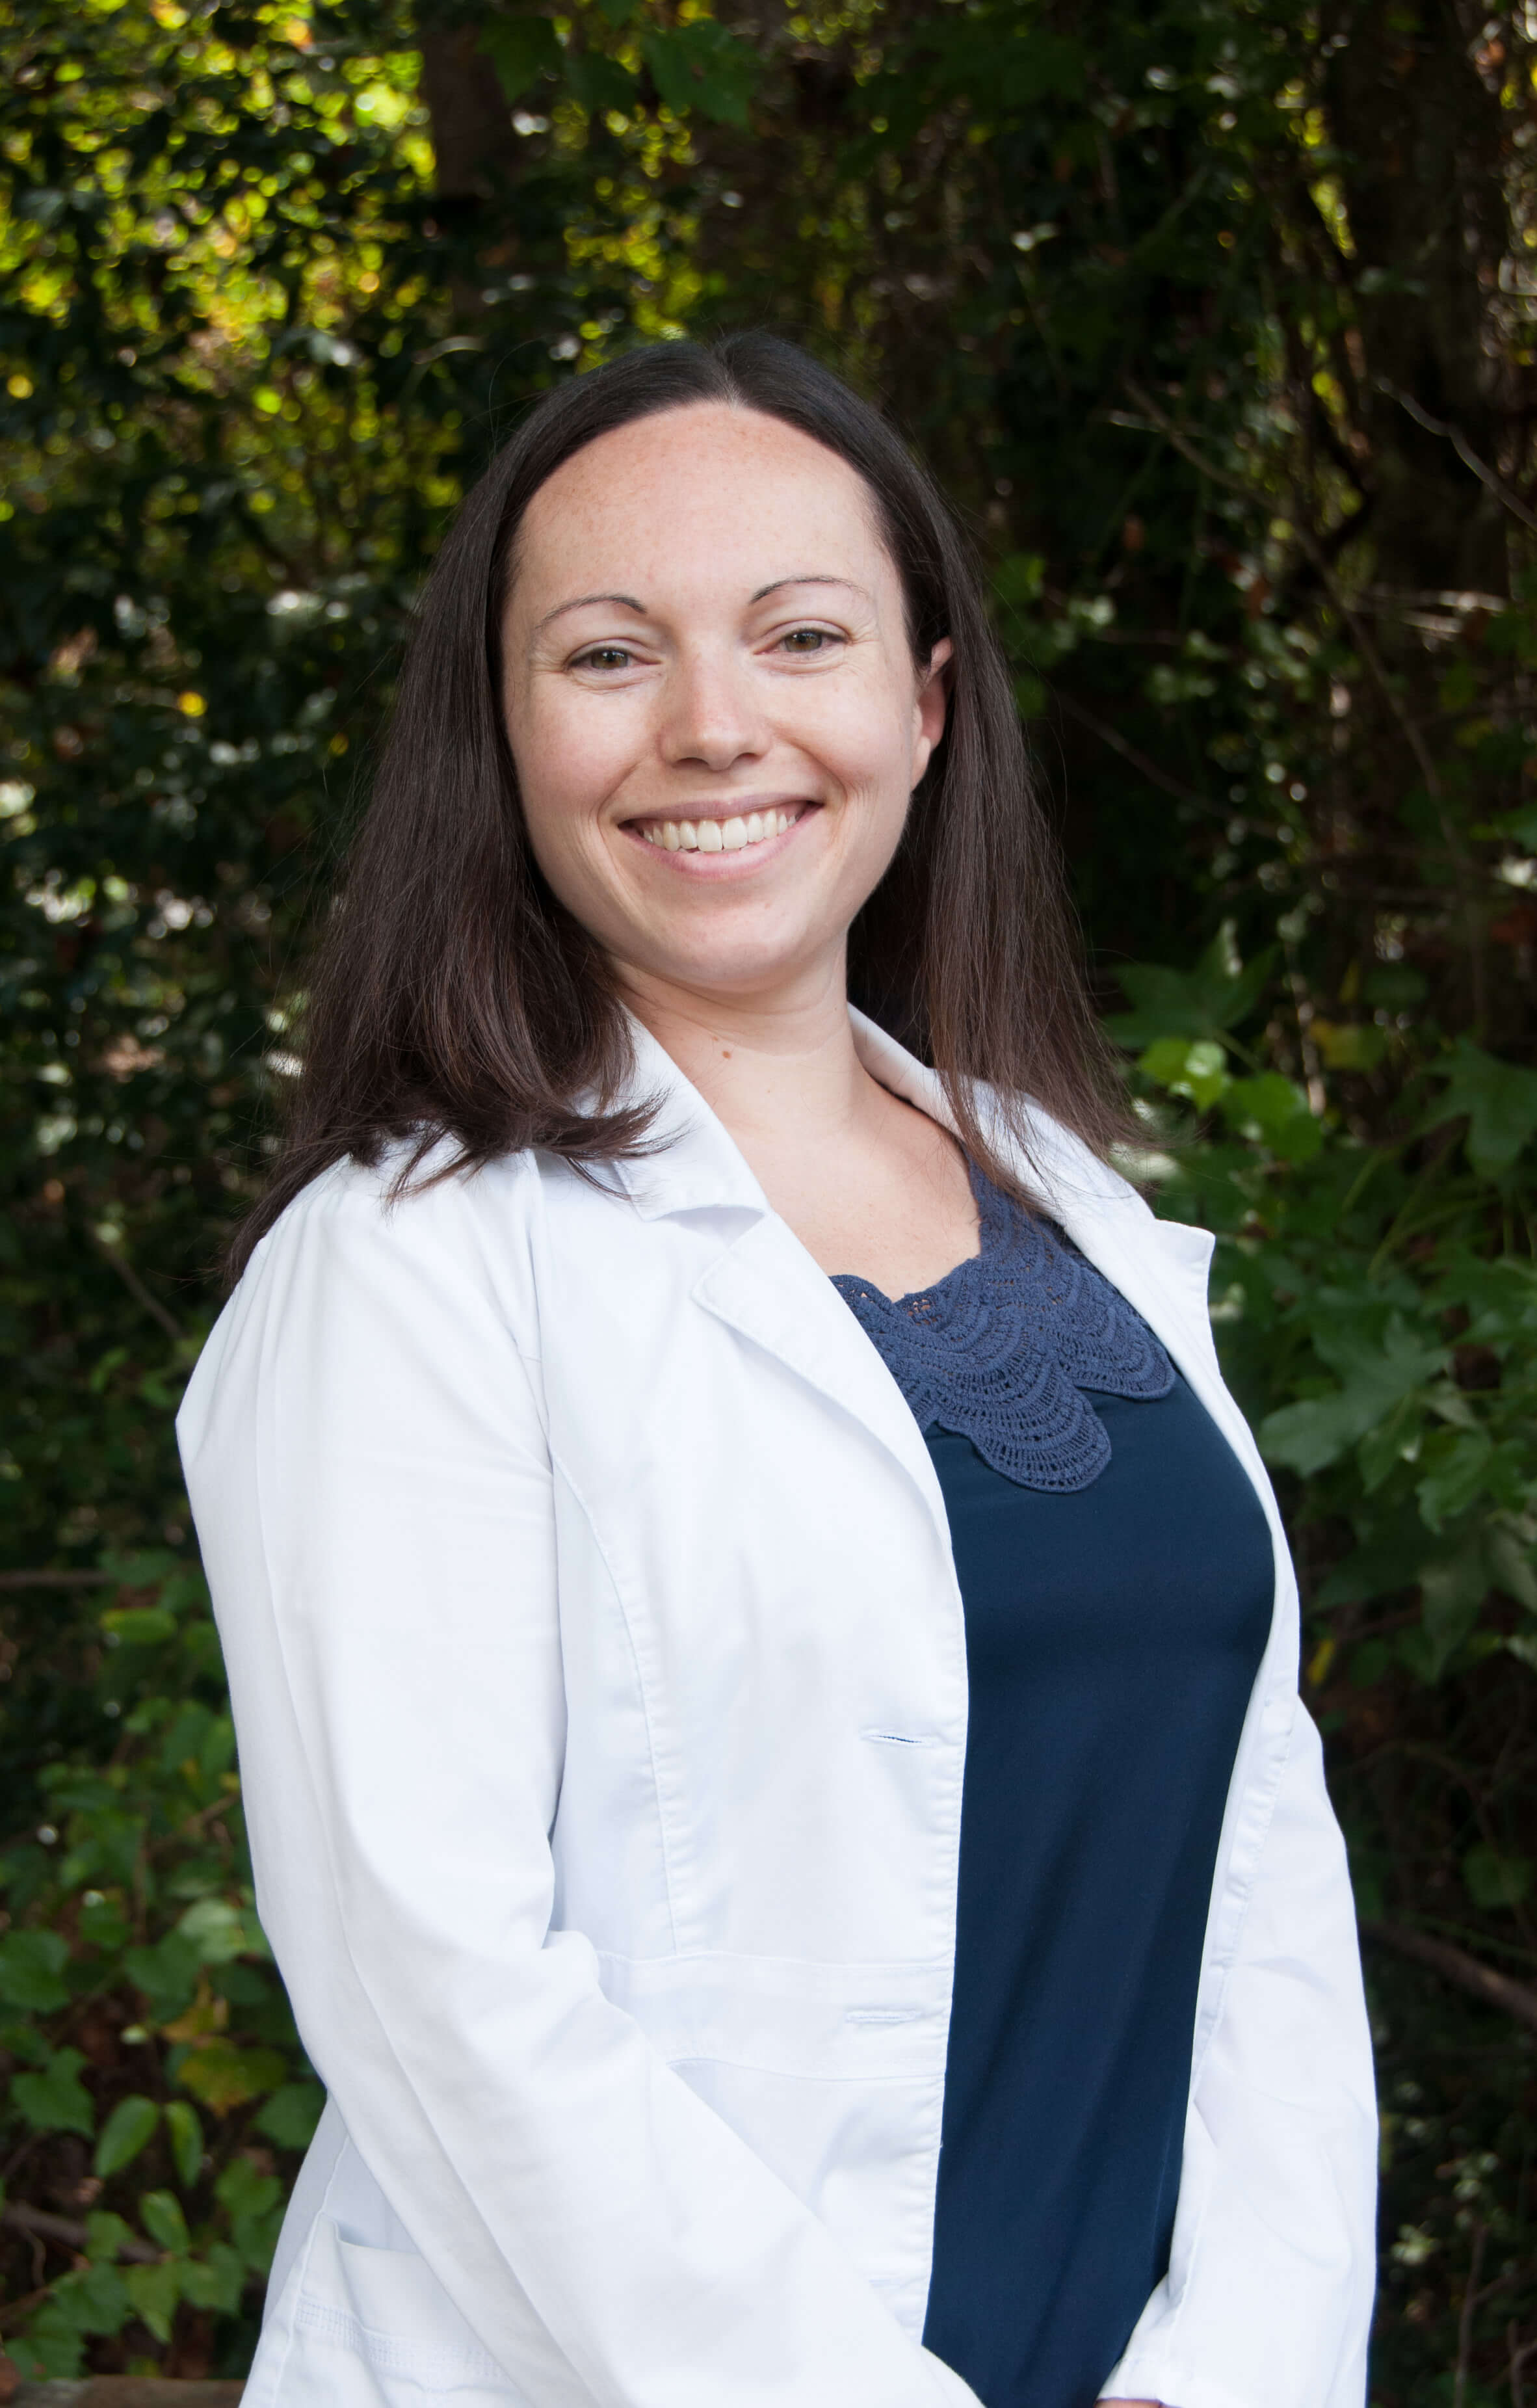 Dr. Amy Crutchfield